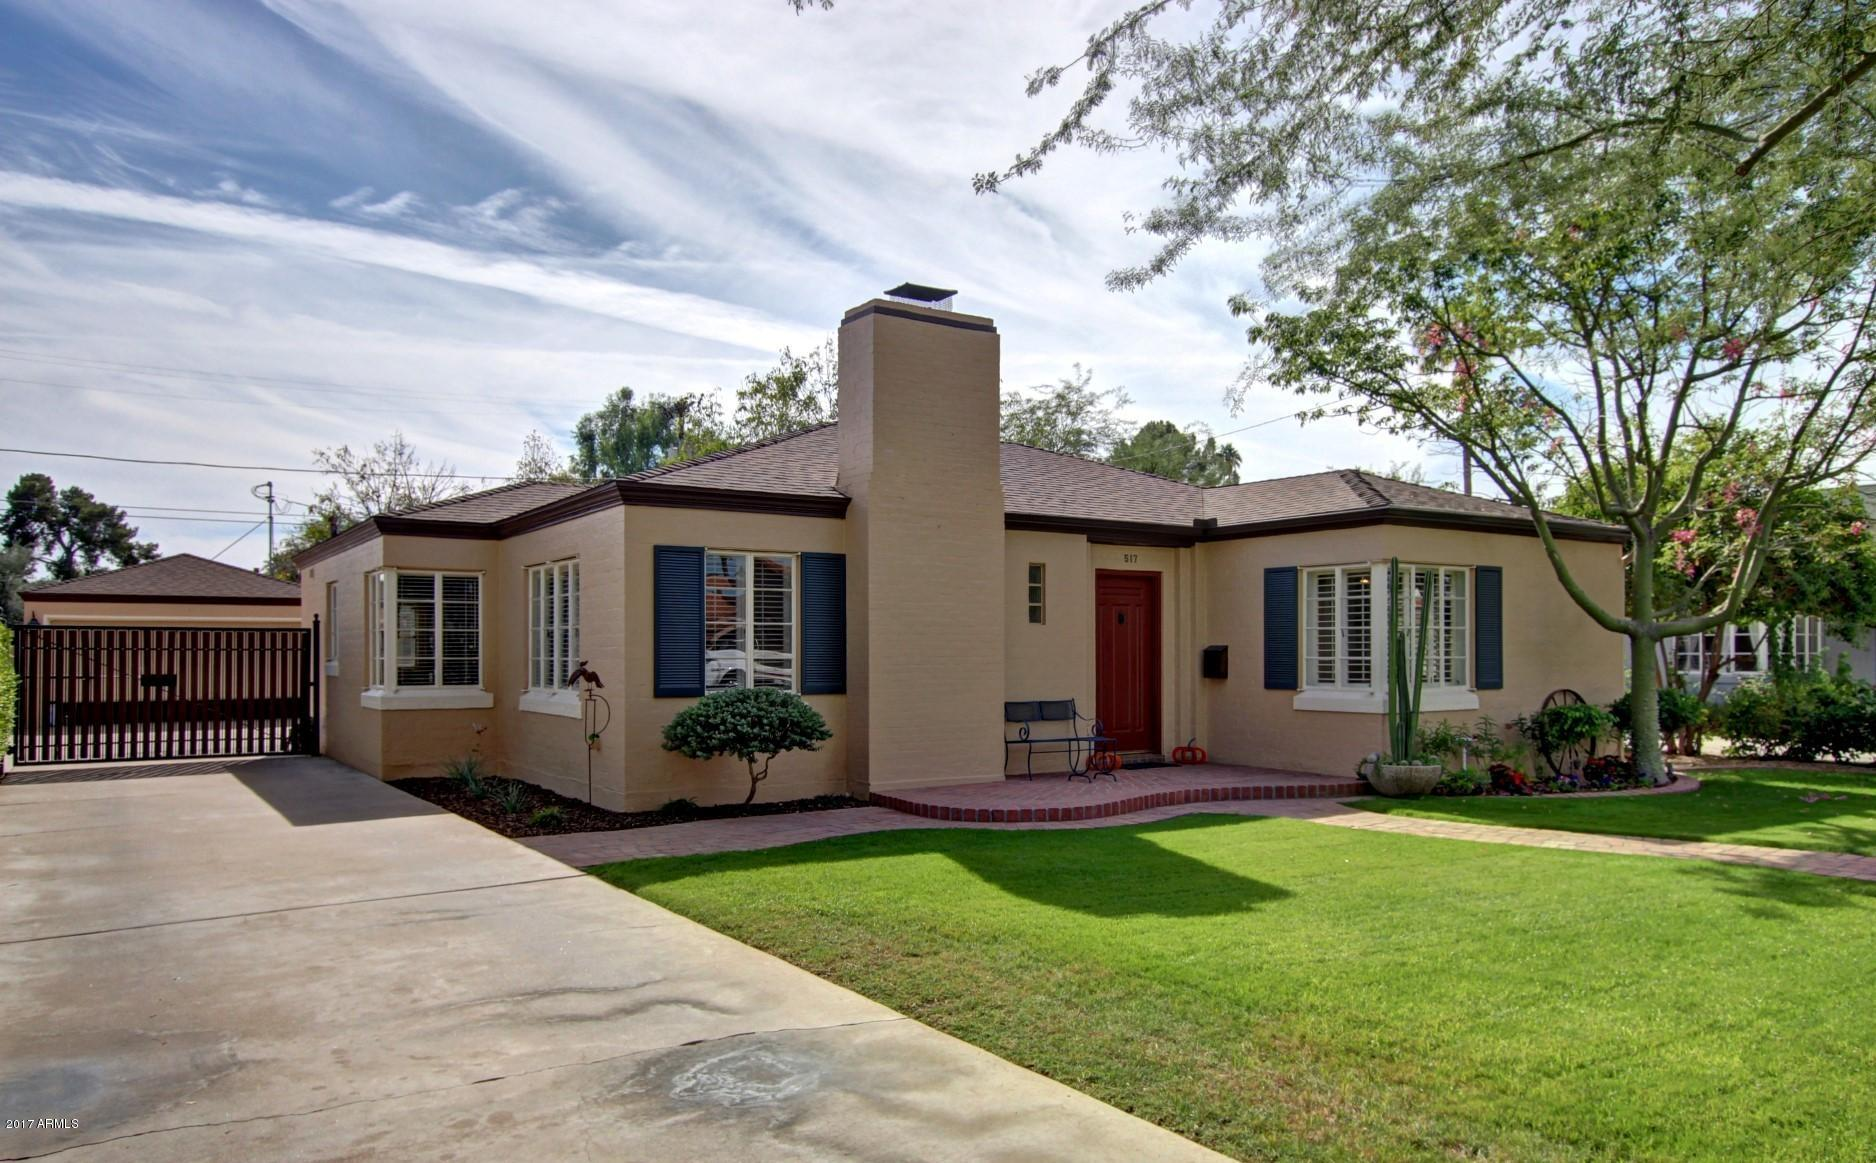 Historic homes for sale in phoenix 39 s willo historic district for Victorian houses for sale in arizona